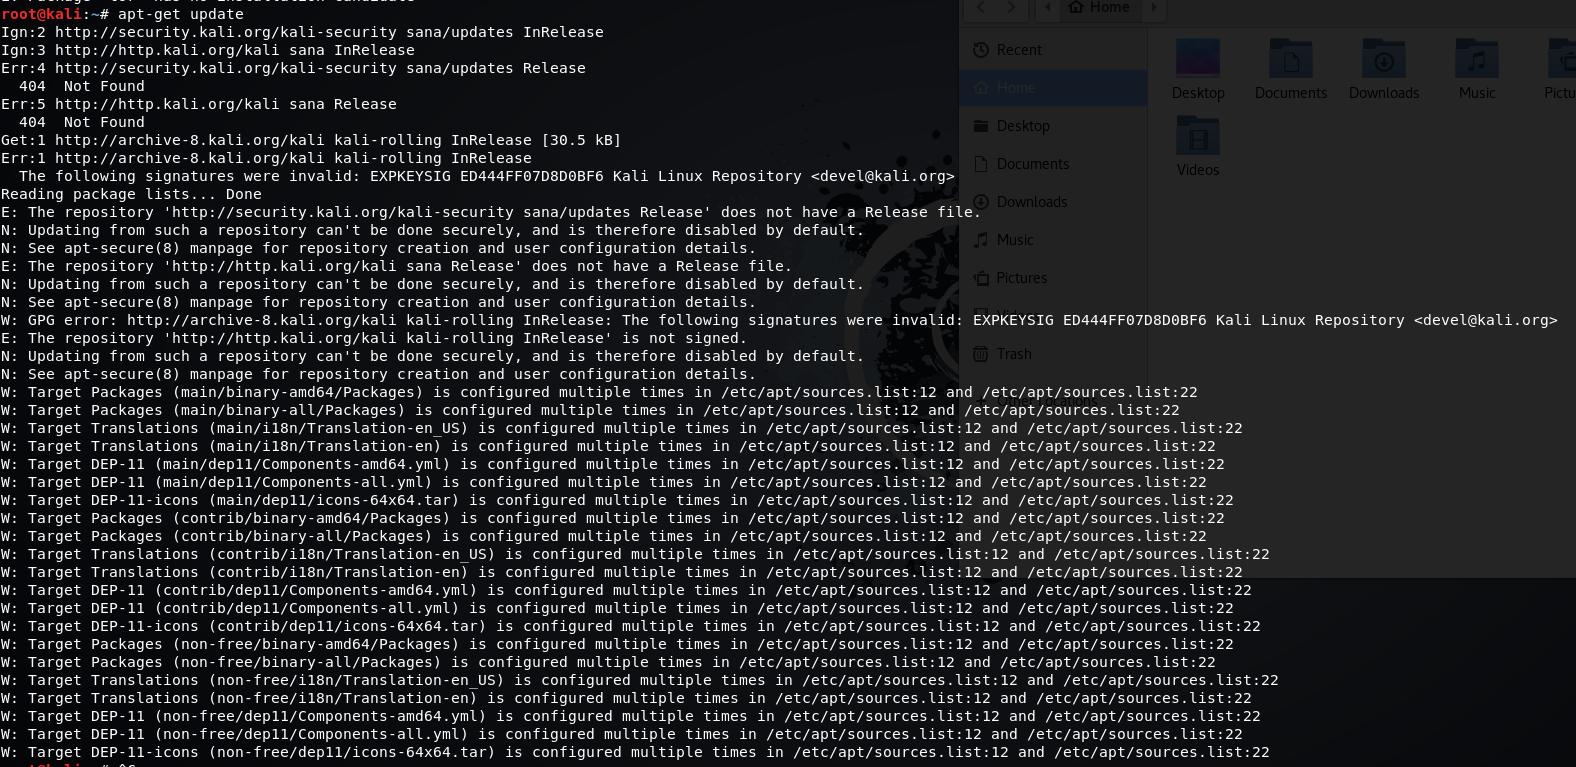 apt-get update error